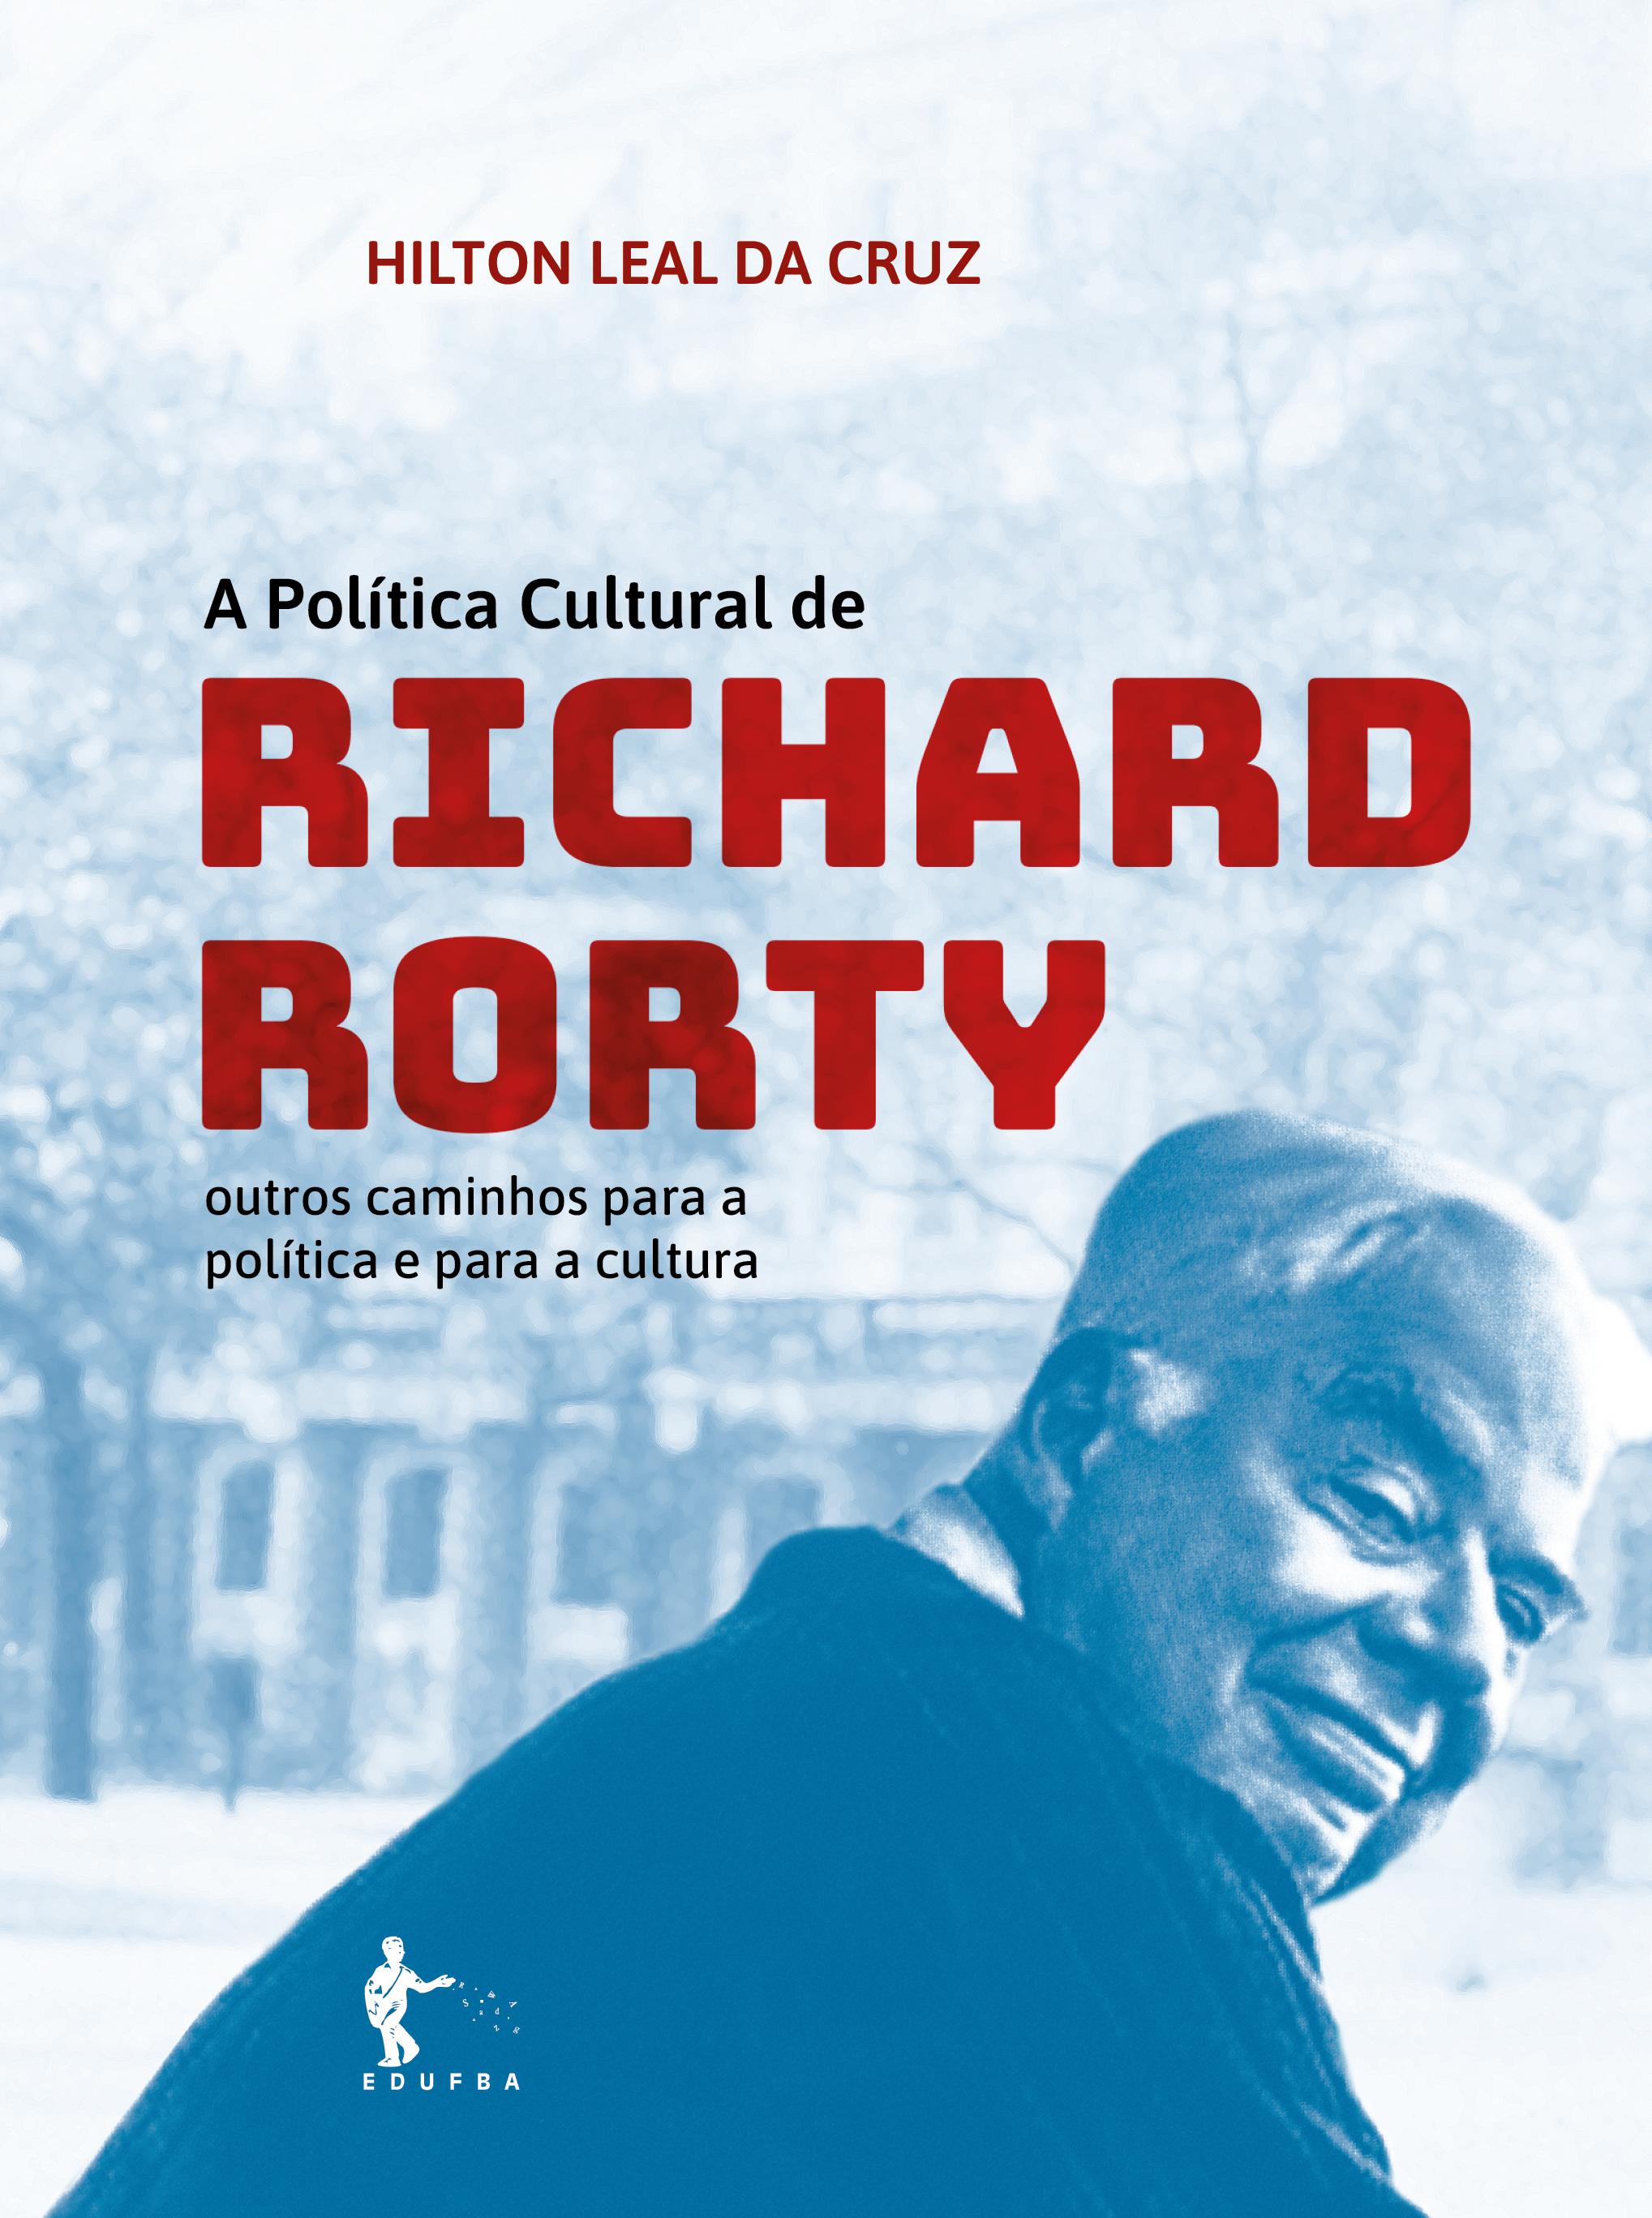 A Política Cultural de Richard Rorty - outros caminhos para a política e para a cultura, livro de Hilton Leal da Cruz